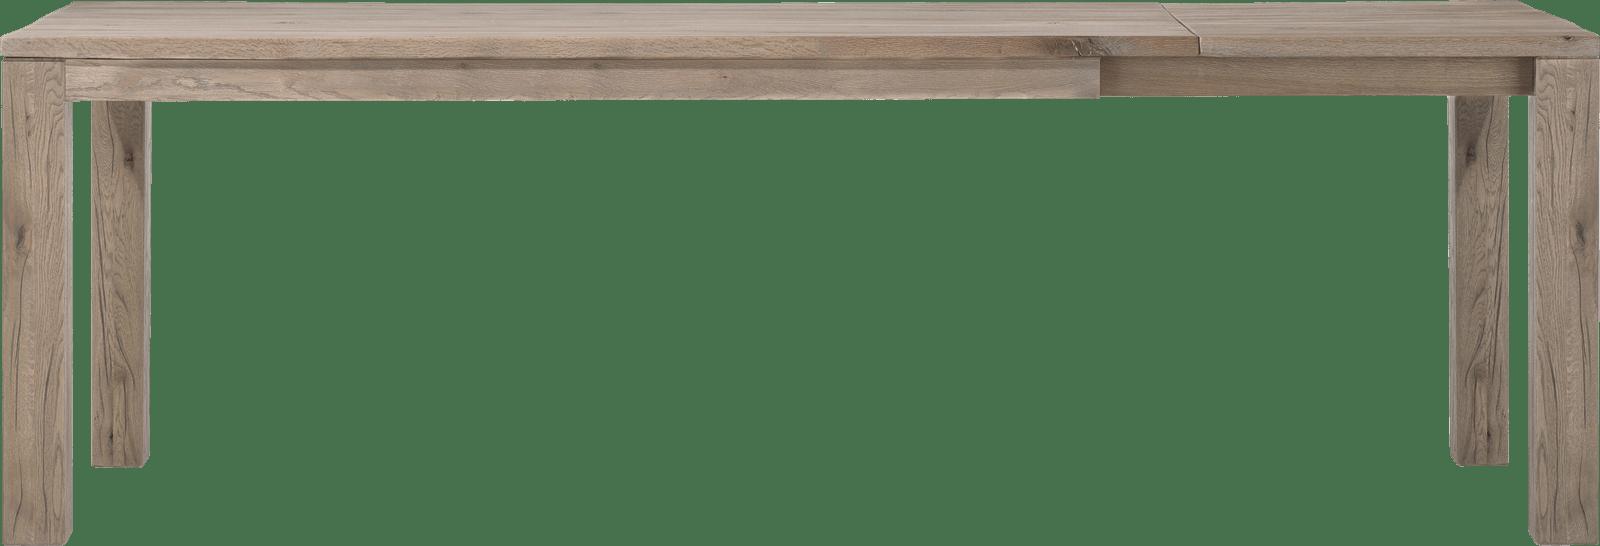 Masters - uitschuiftafel 180 (+ 60) x 90 cm - hout 9x9